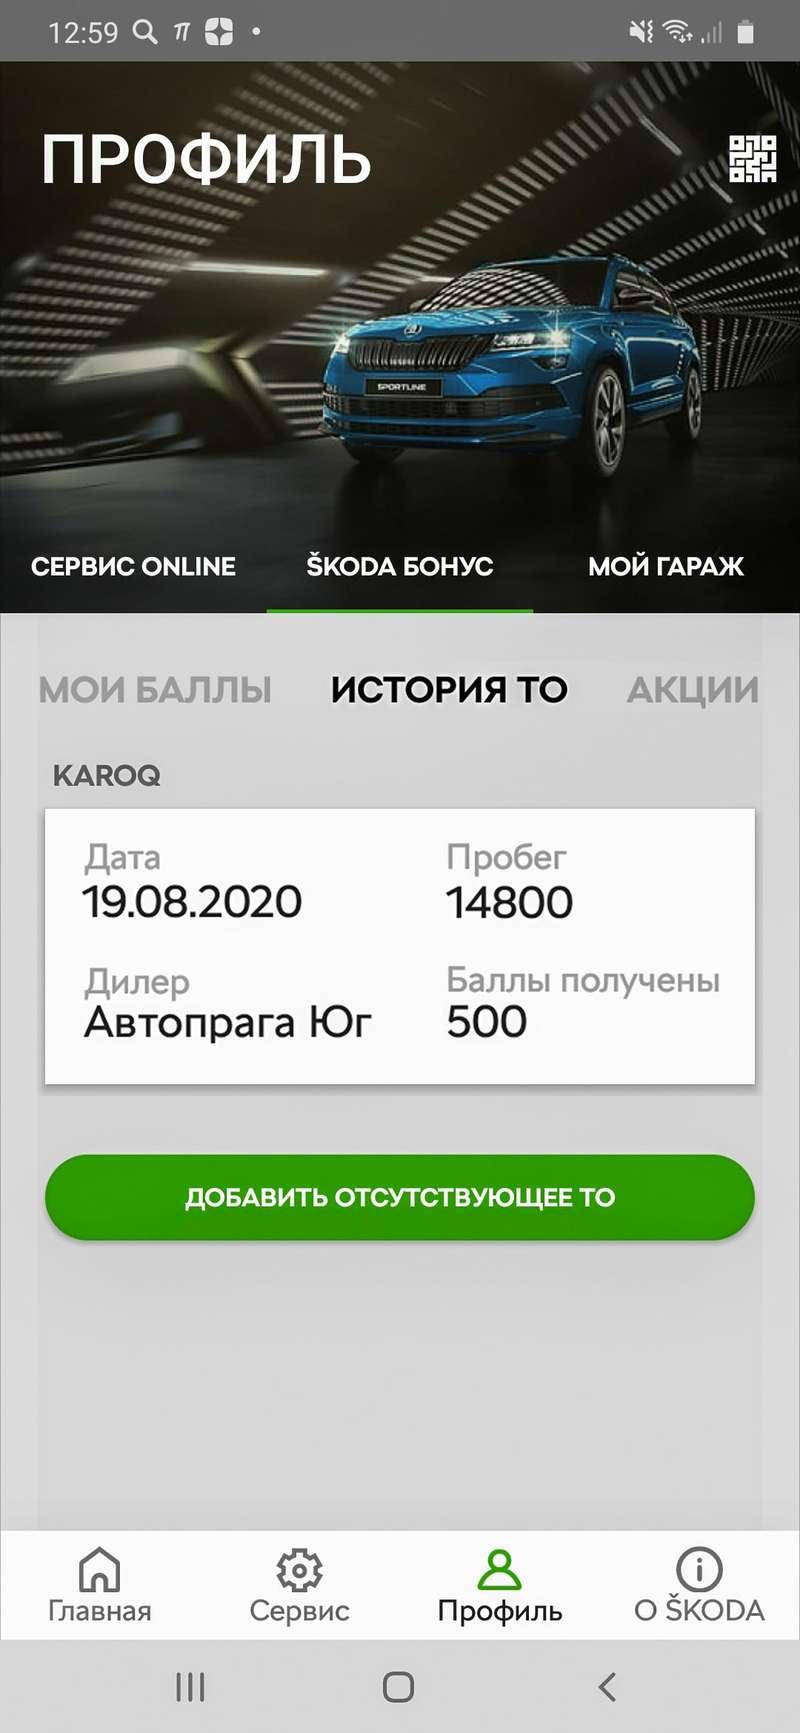 Skoda Karoq: 12000 рублей (!) запервое ТО